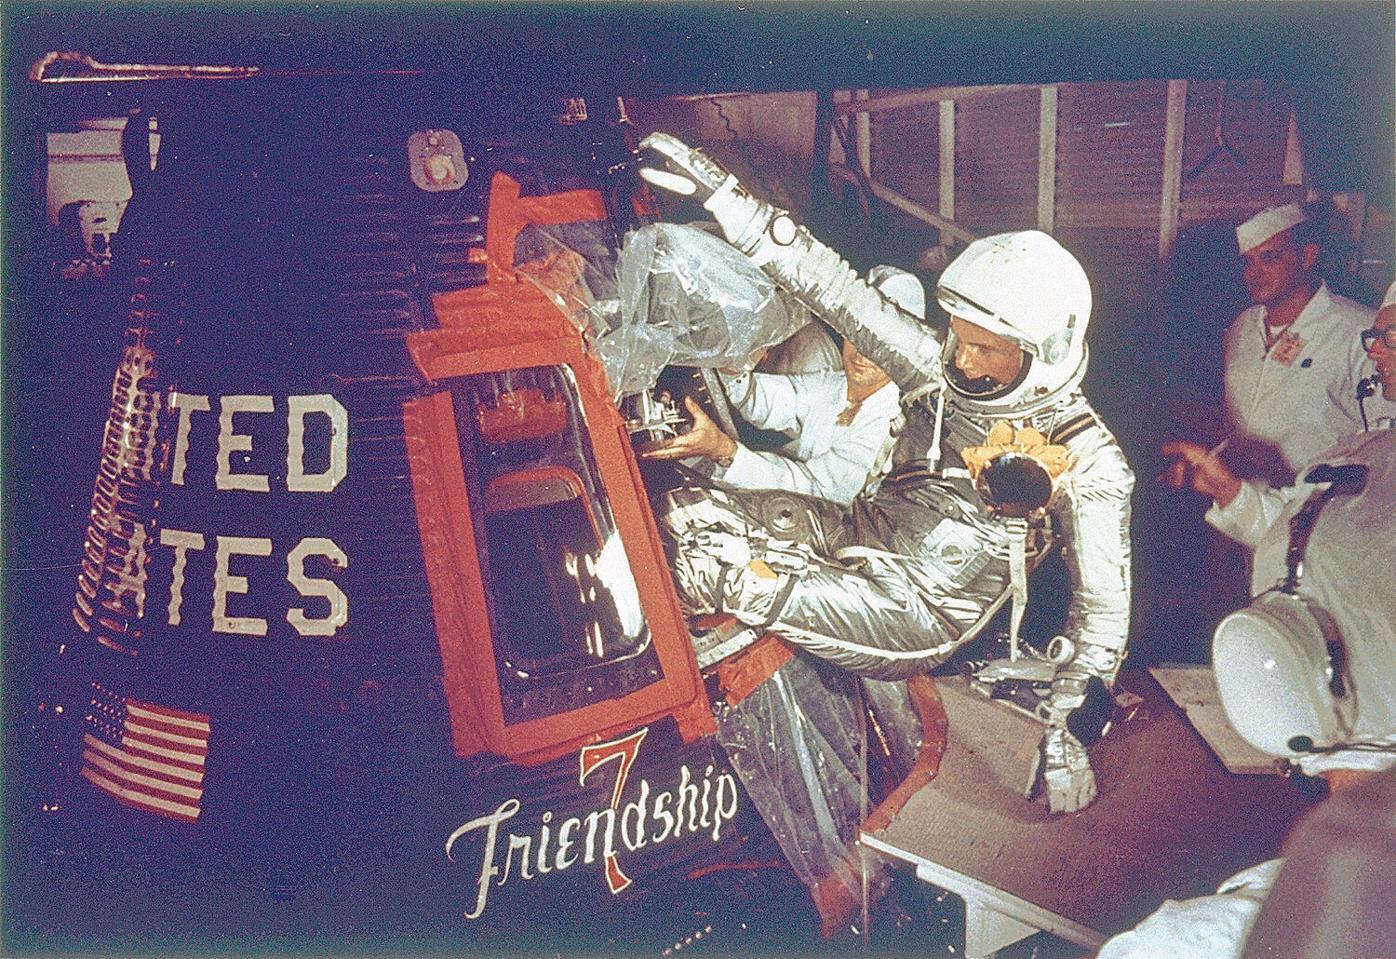 Guiding tech from Berkshires aided John Glenn's pioneering 1962 orbit